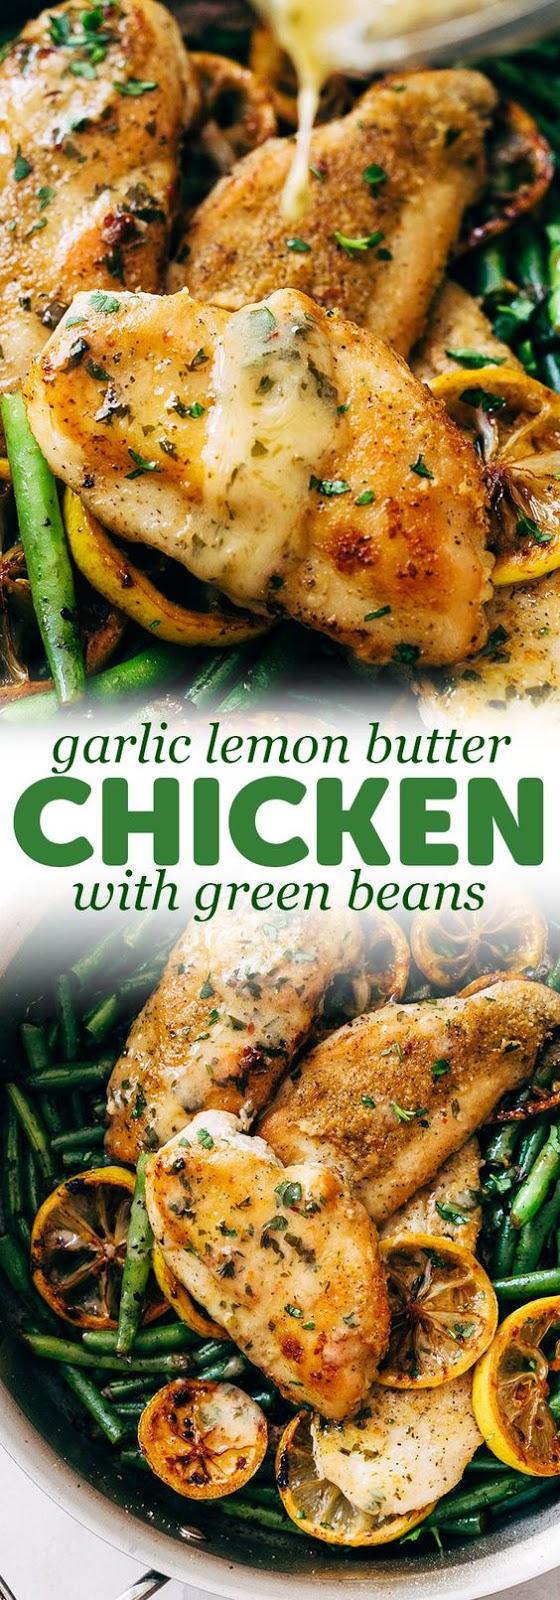 Delicious Skillet Garlic Lemon Butter Chicken